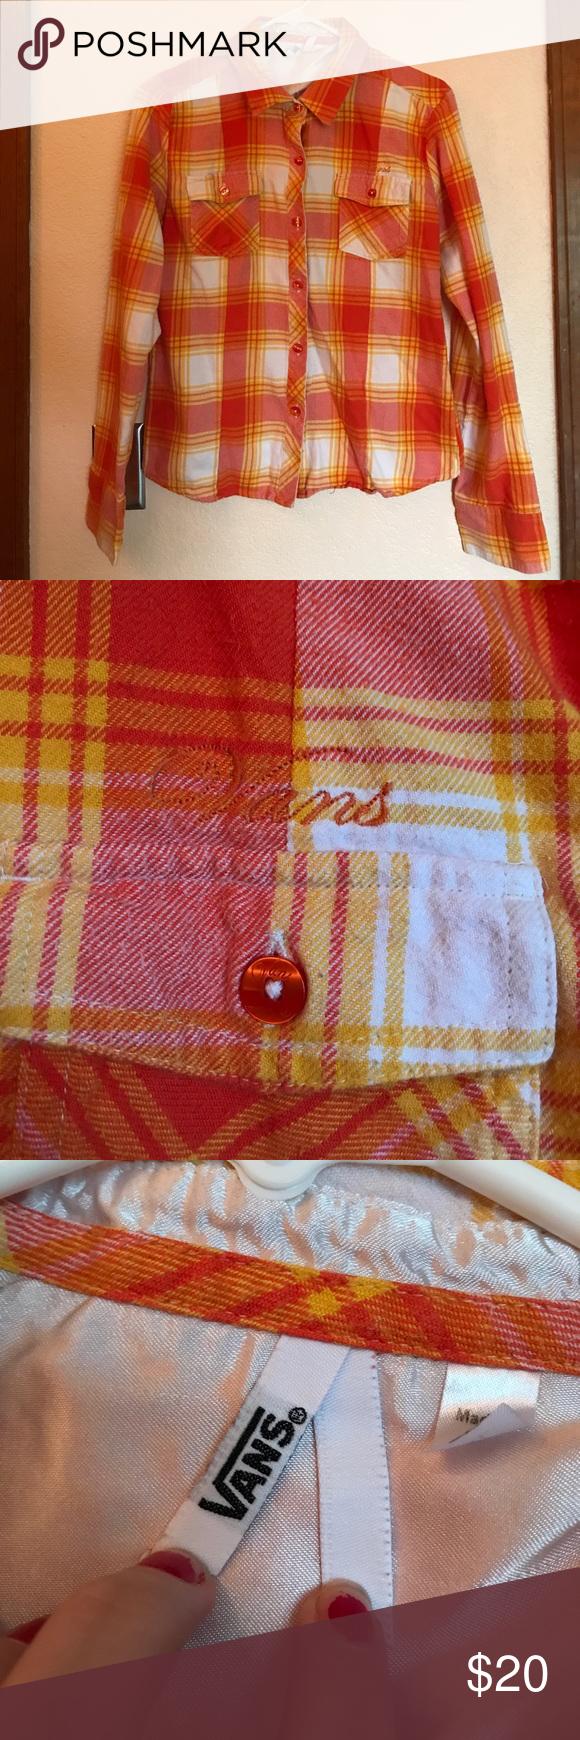 Flannel shirts yellow  VANS Orange u Yellow Flannel shirt  Flannel shirts Flannels and Vans